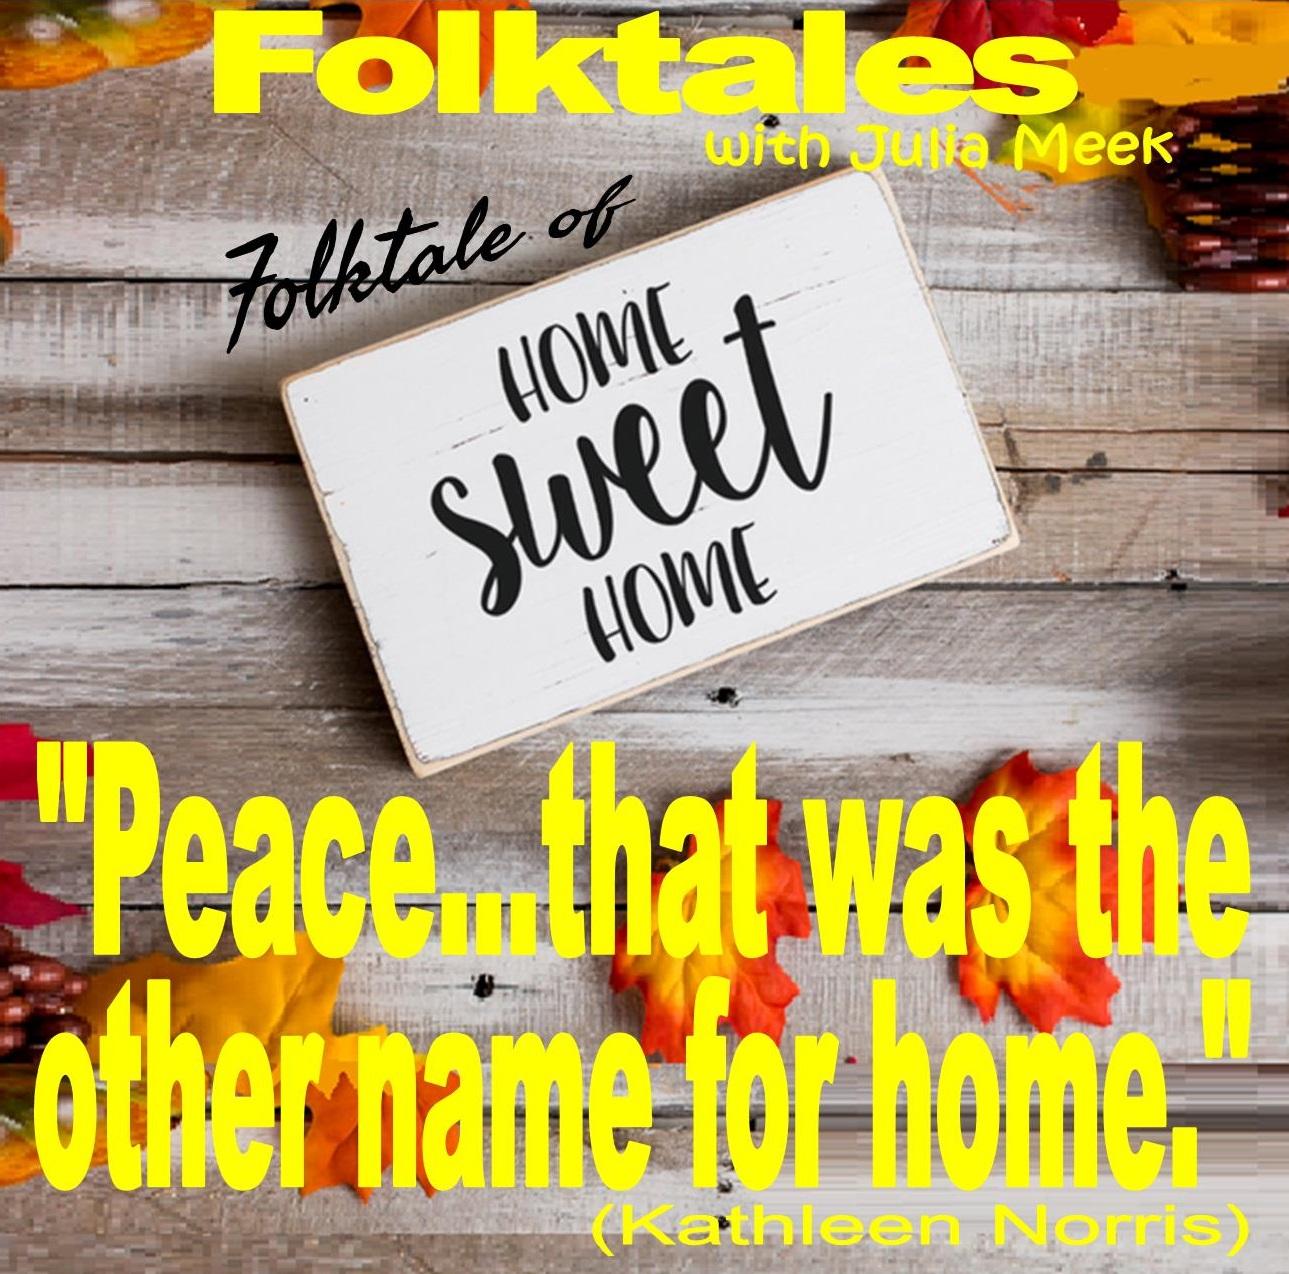 Caption: WBOI's Folktale of Home Sweet Home, Credit: Julia Meek